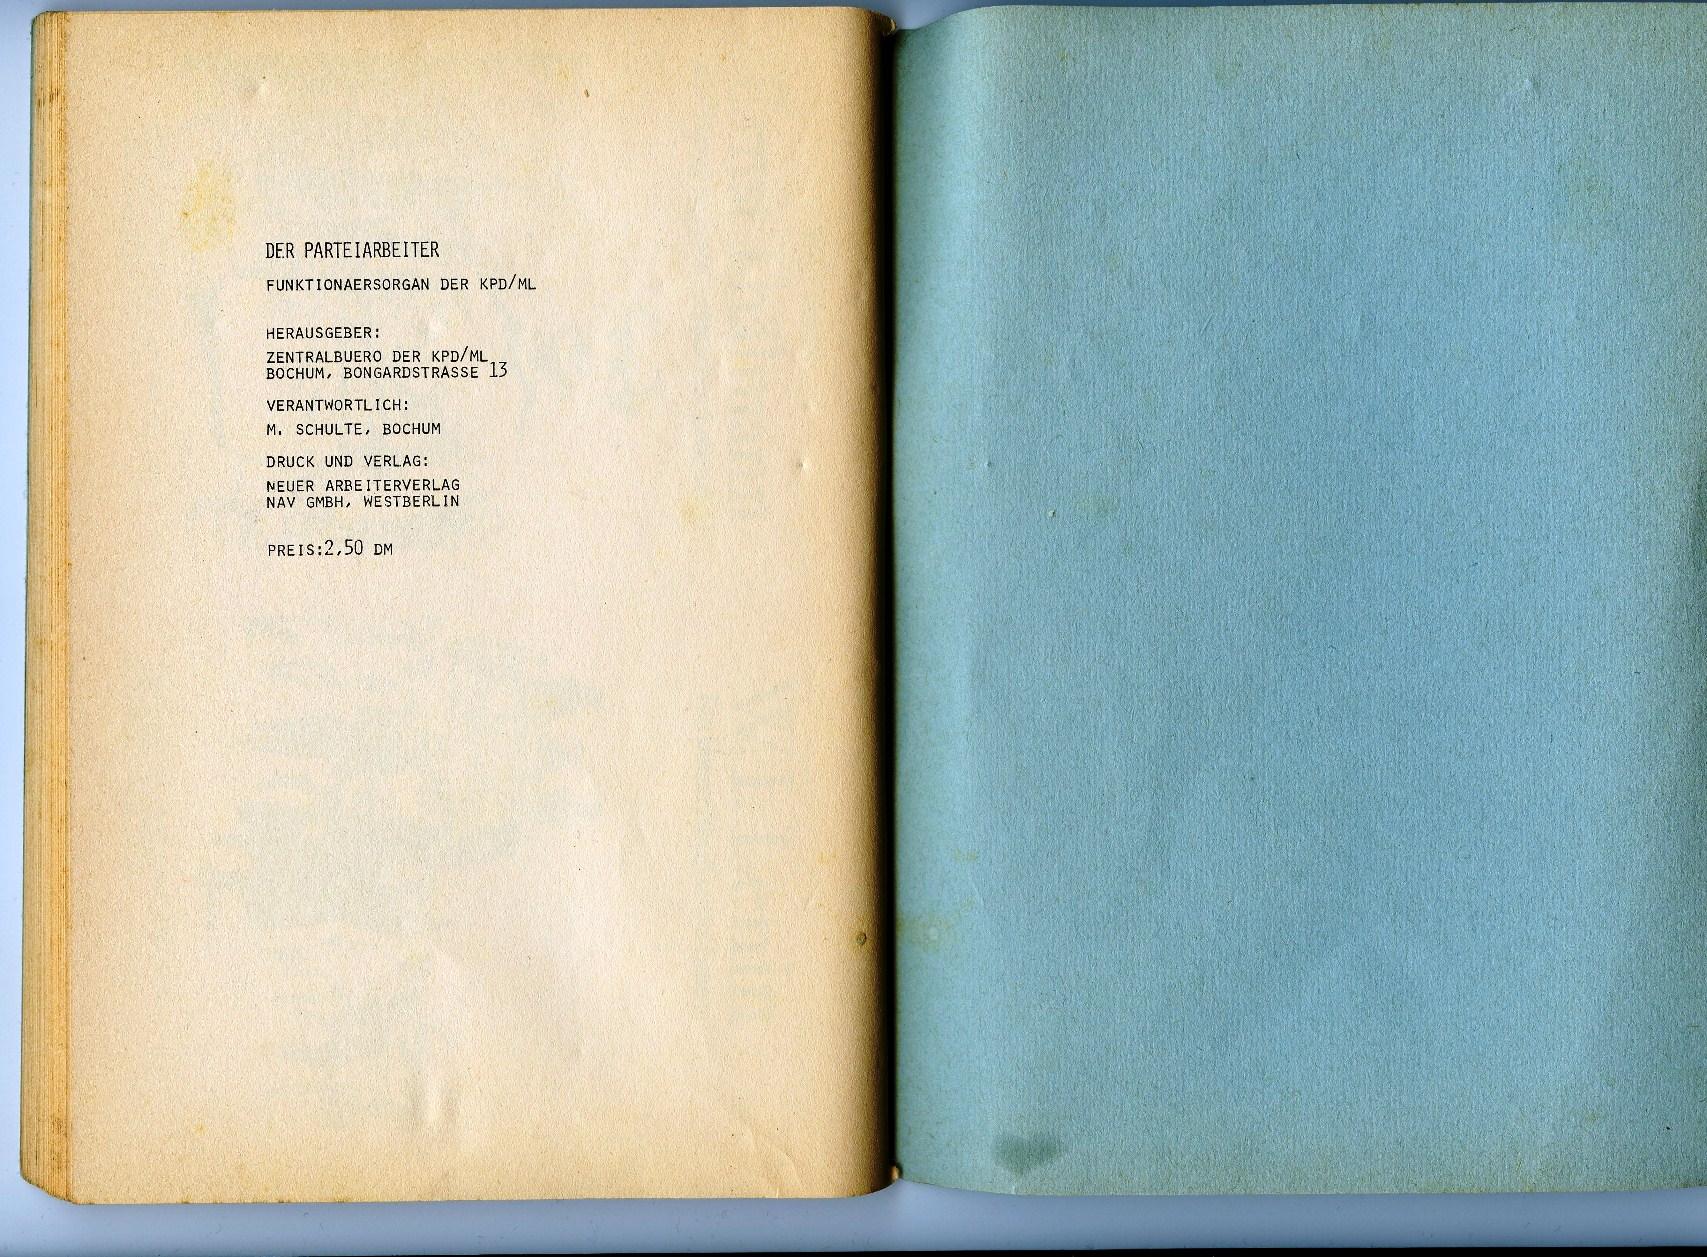 ZB_Parteiarbeiter_1971_08_58